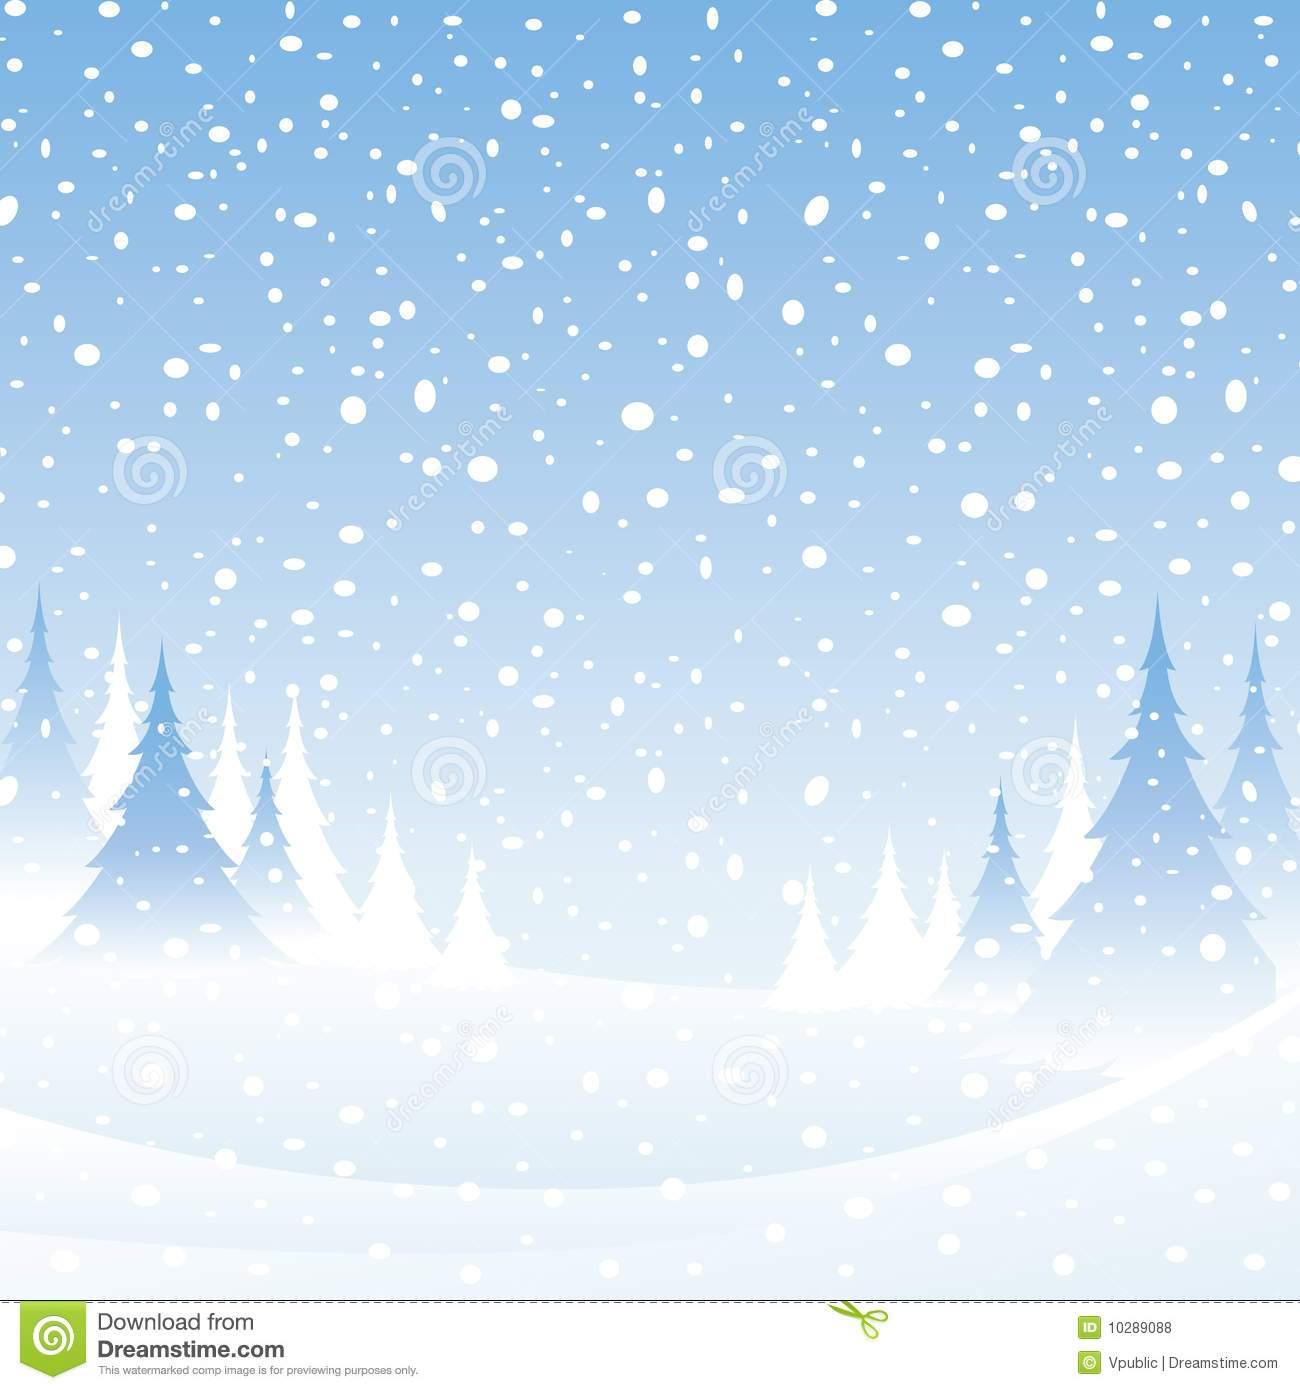 Christmas snow scene clipart 1 » Clipart Portal.